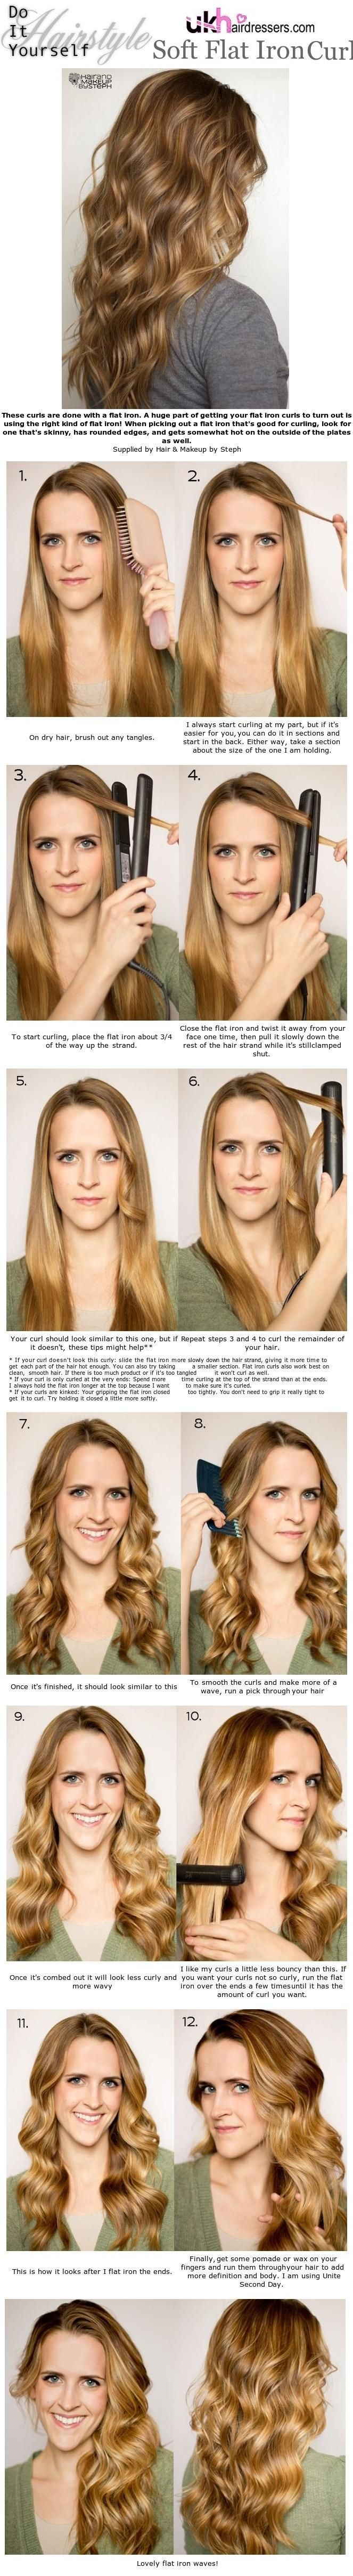 119 best Hair DIY images on Pinterest